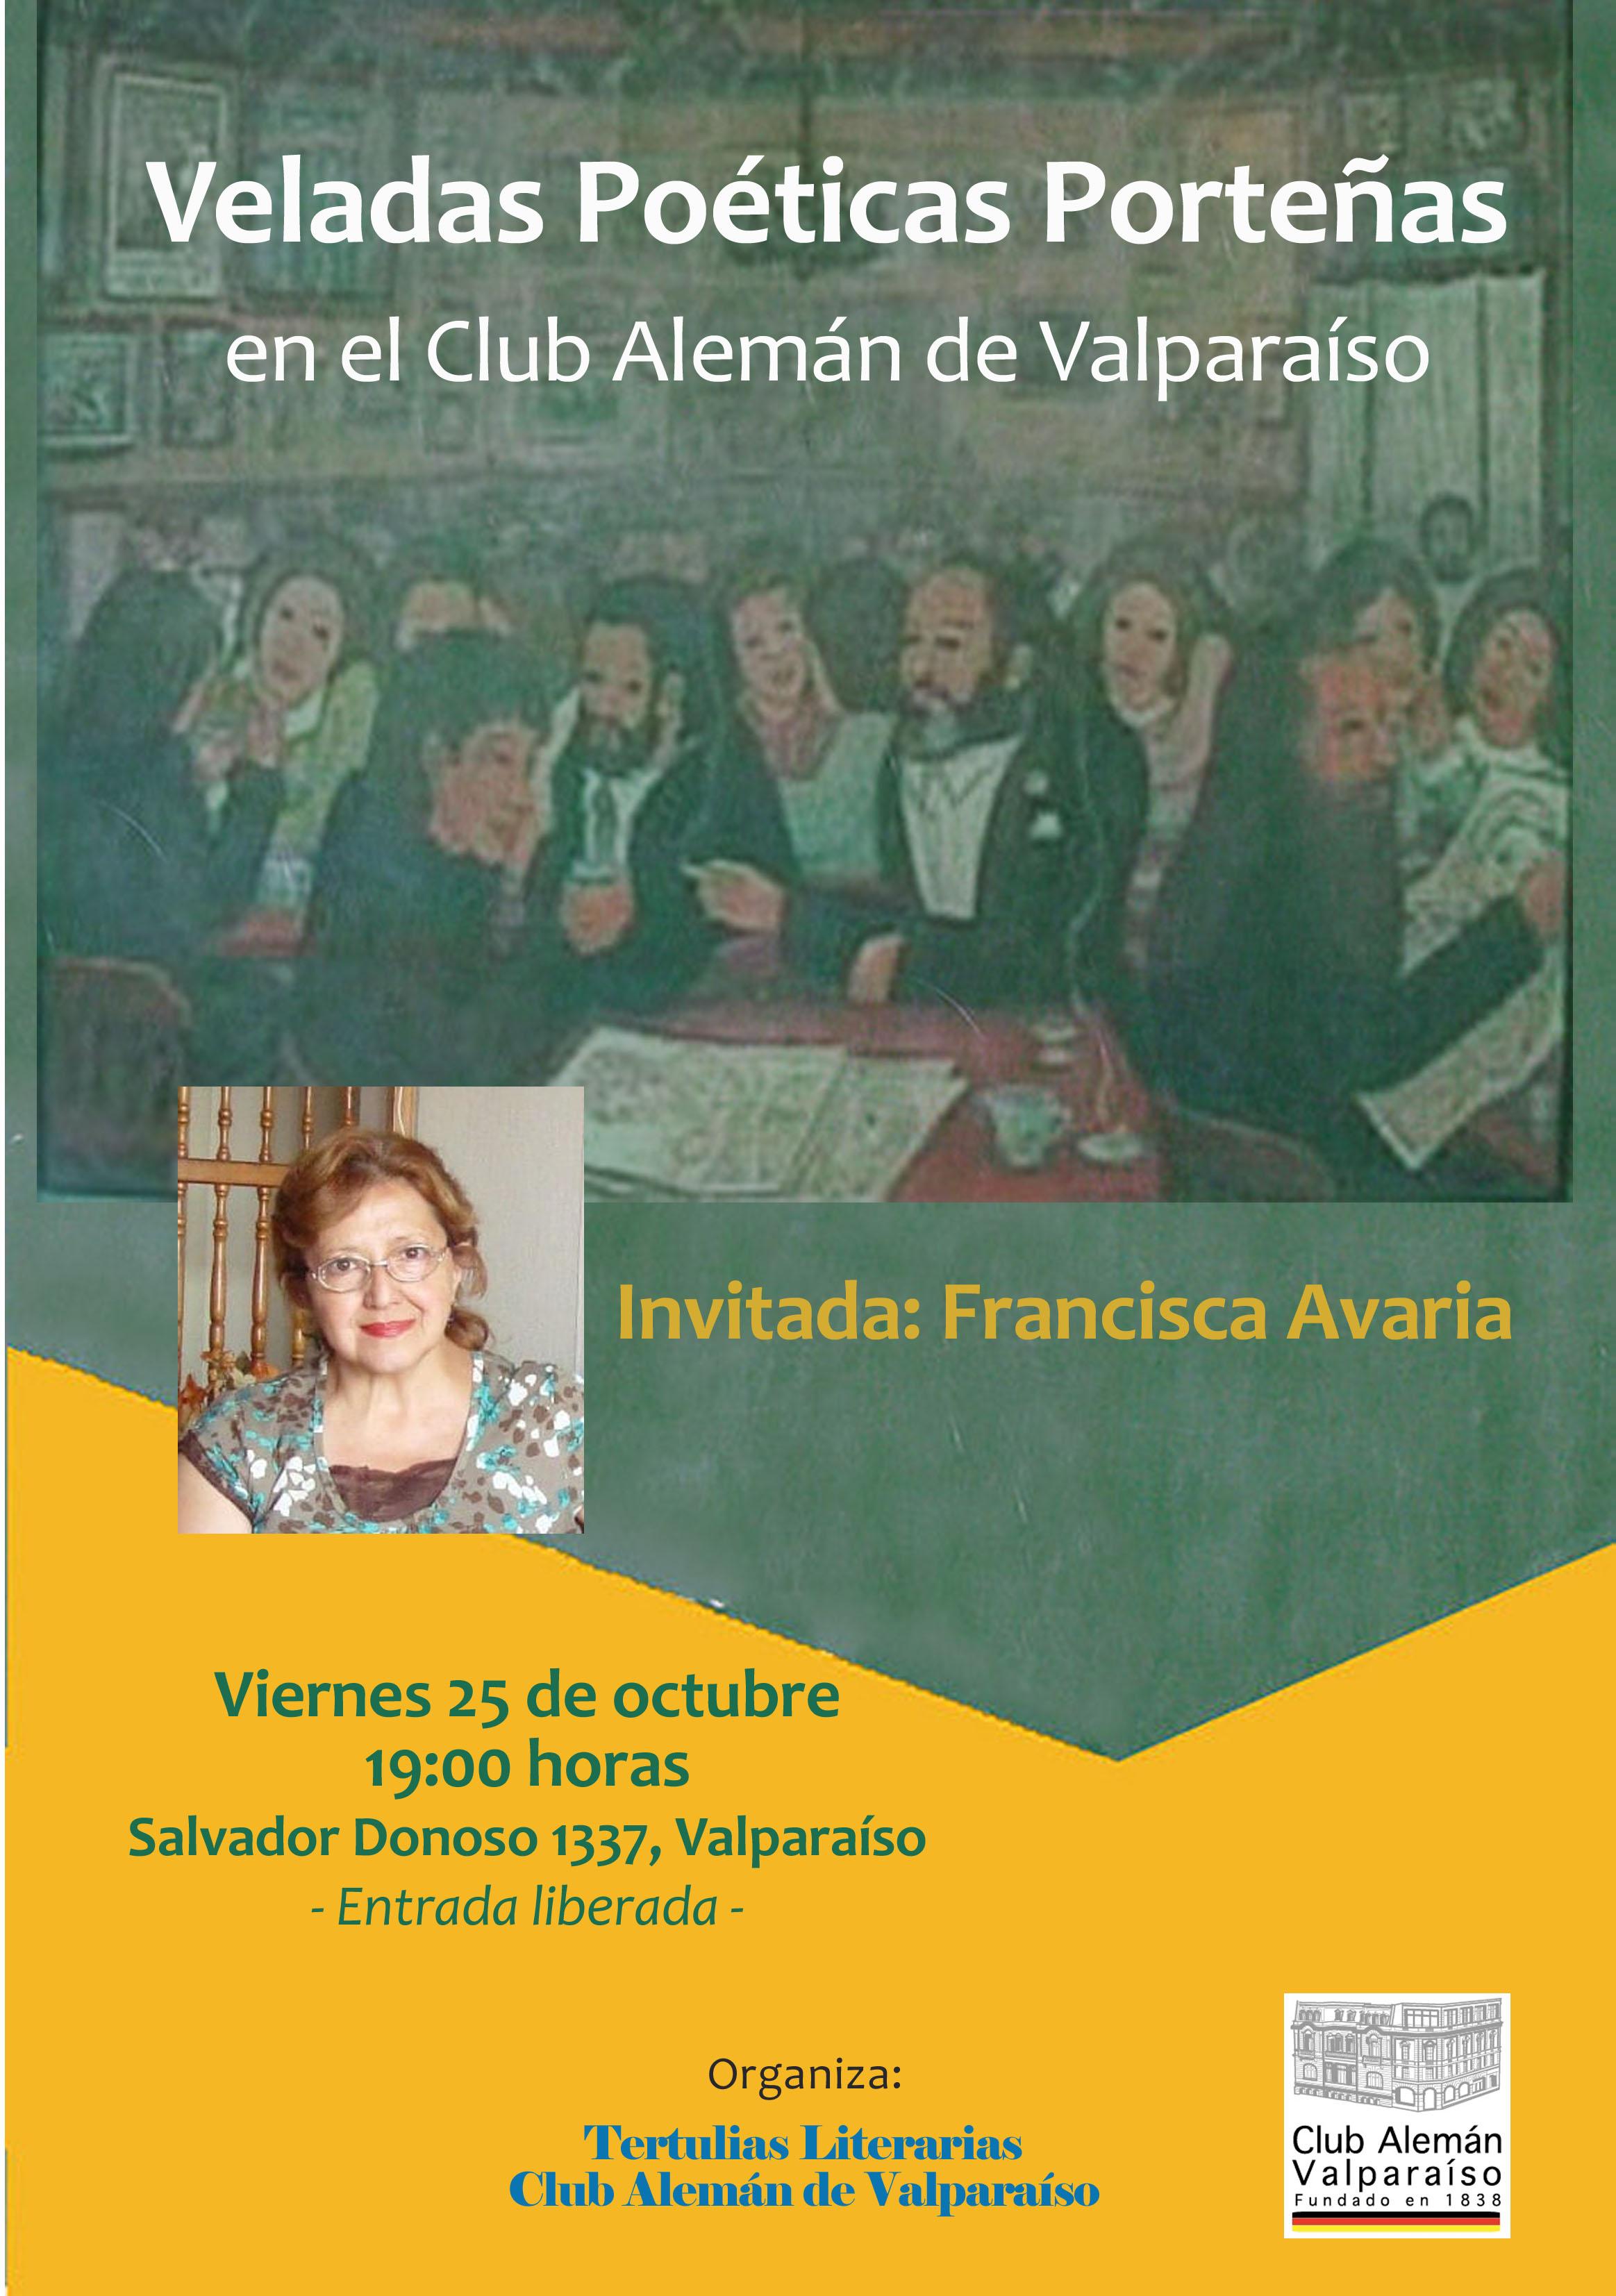 Veladas Poéticas Porteñas – Invitada: Francisca Avaria